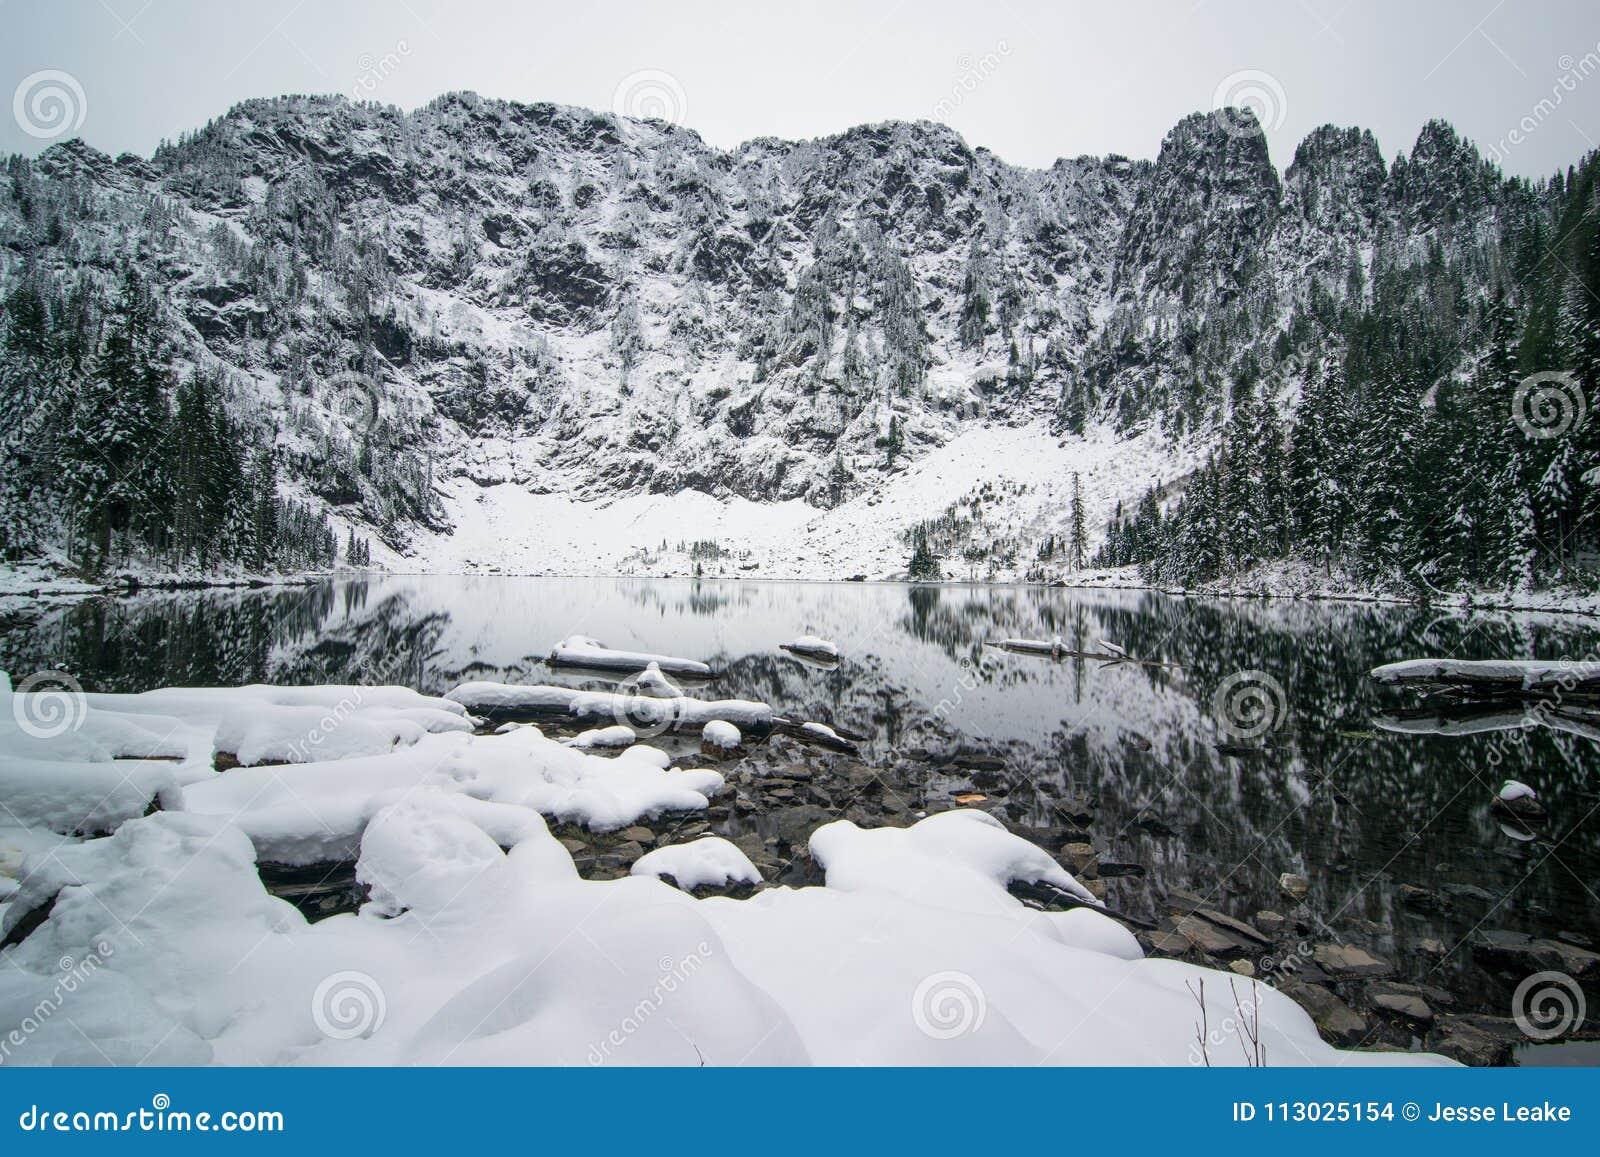 Lago veintidós, no seguro porqué su número 22